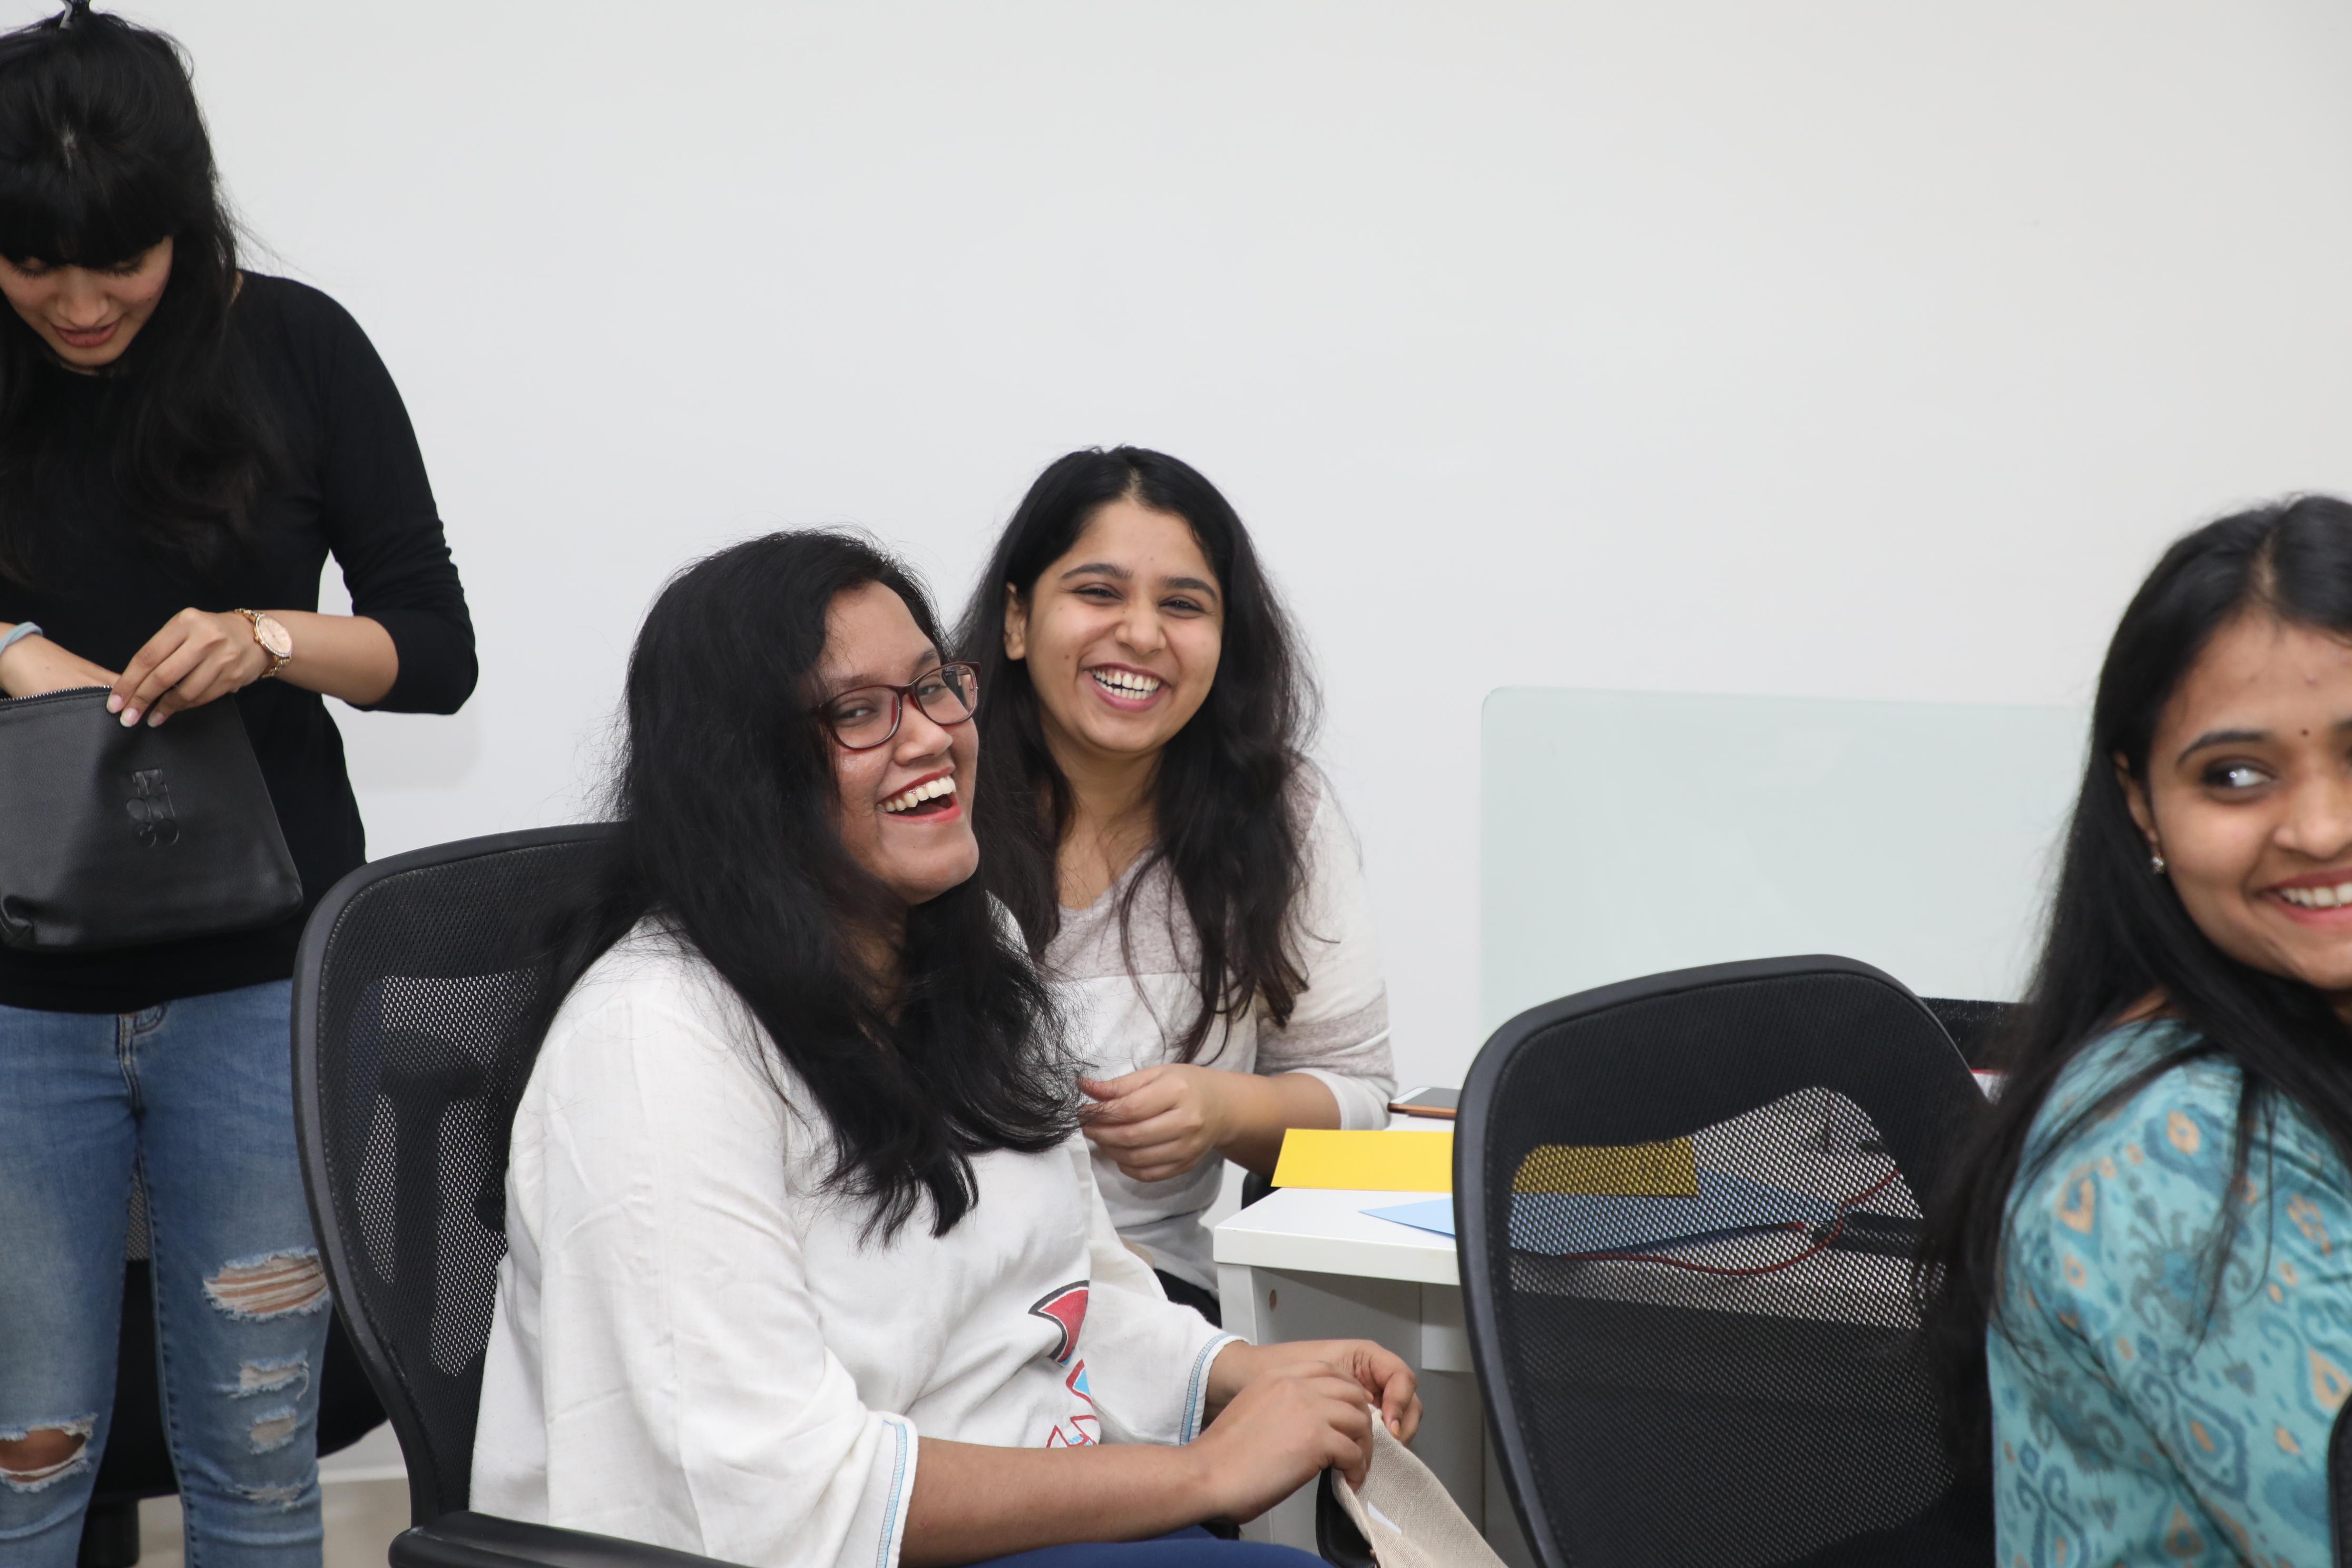 Women's day celebration - smiley faces